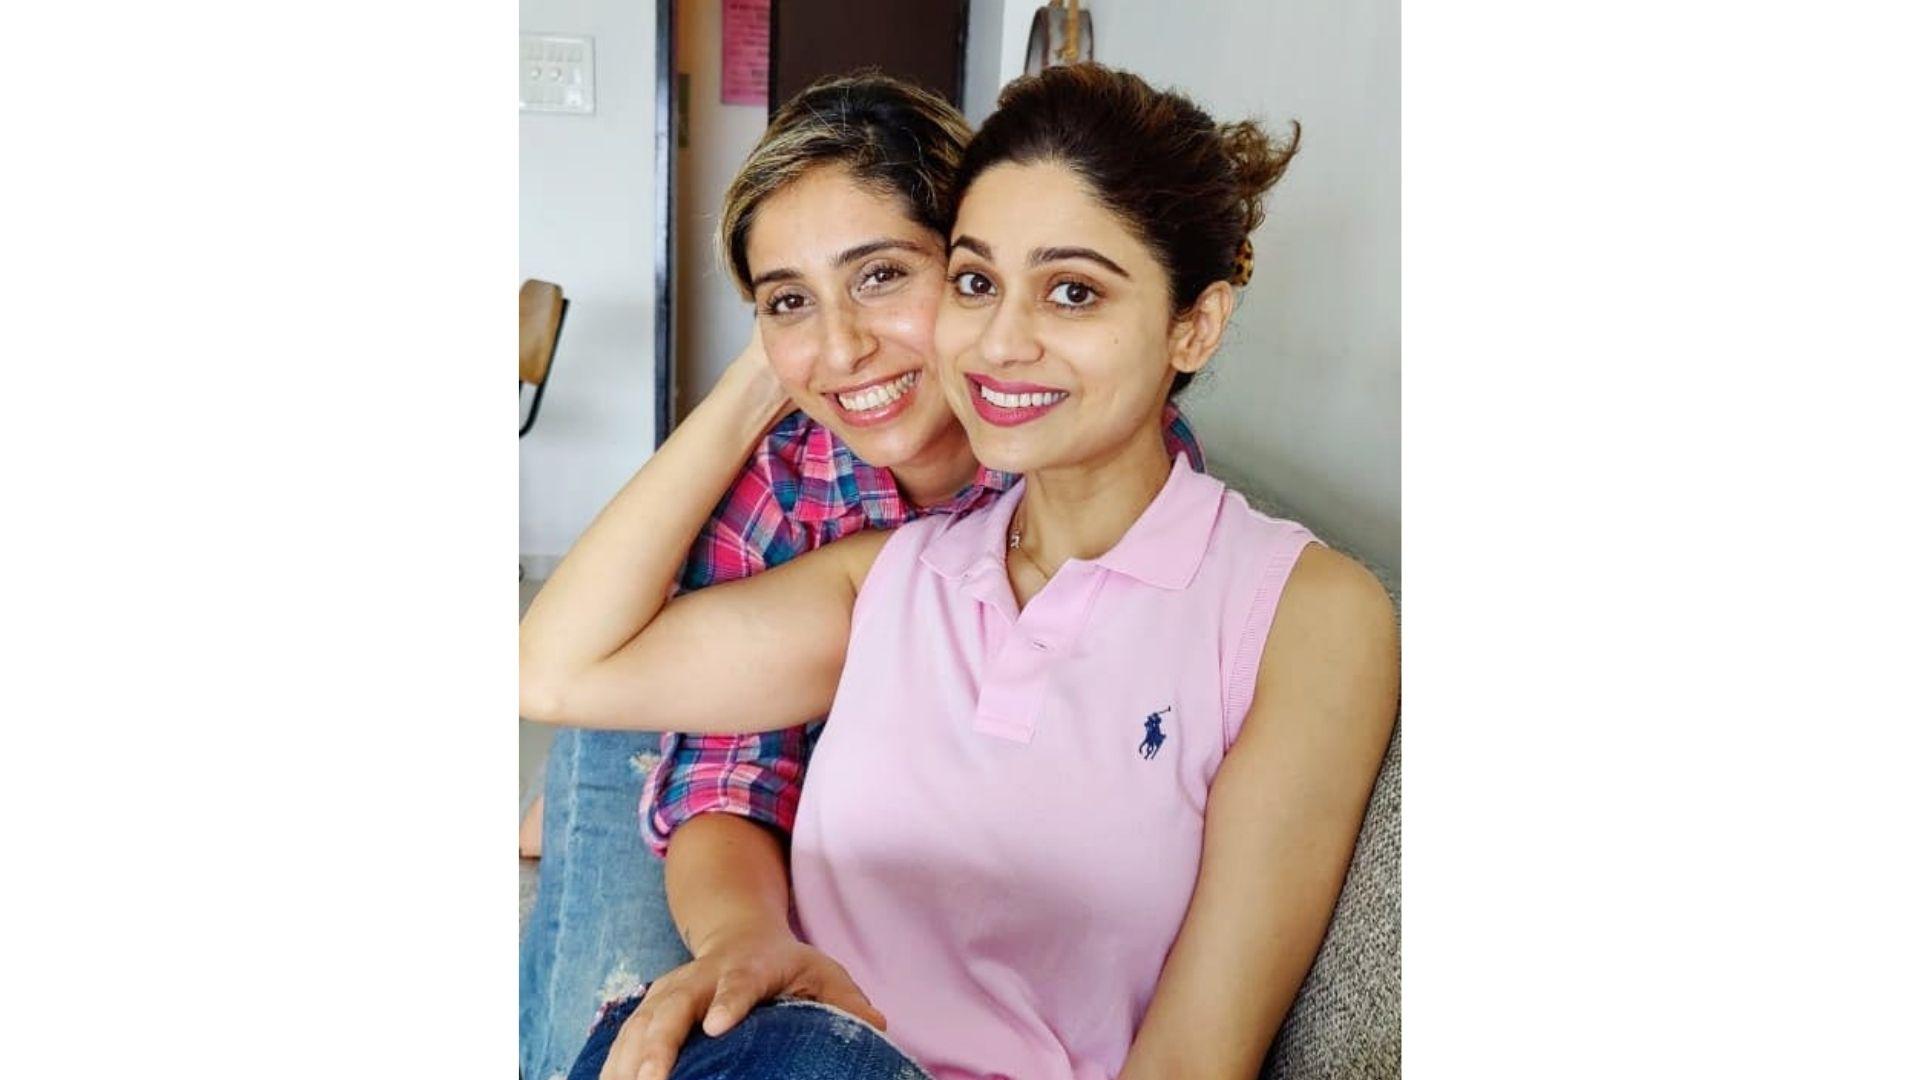 Shamita Shetty And Neha Bhasin Express Grief On The Sudden Demise Of Sidharth Shukla